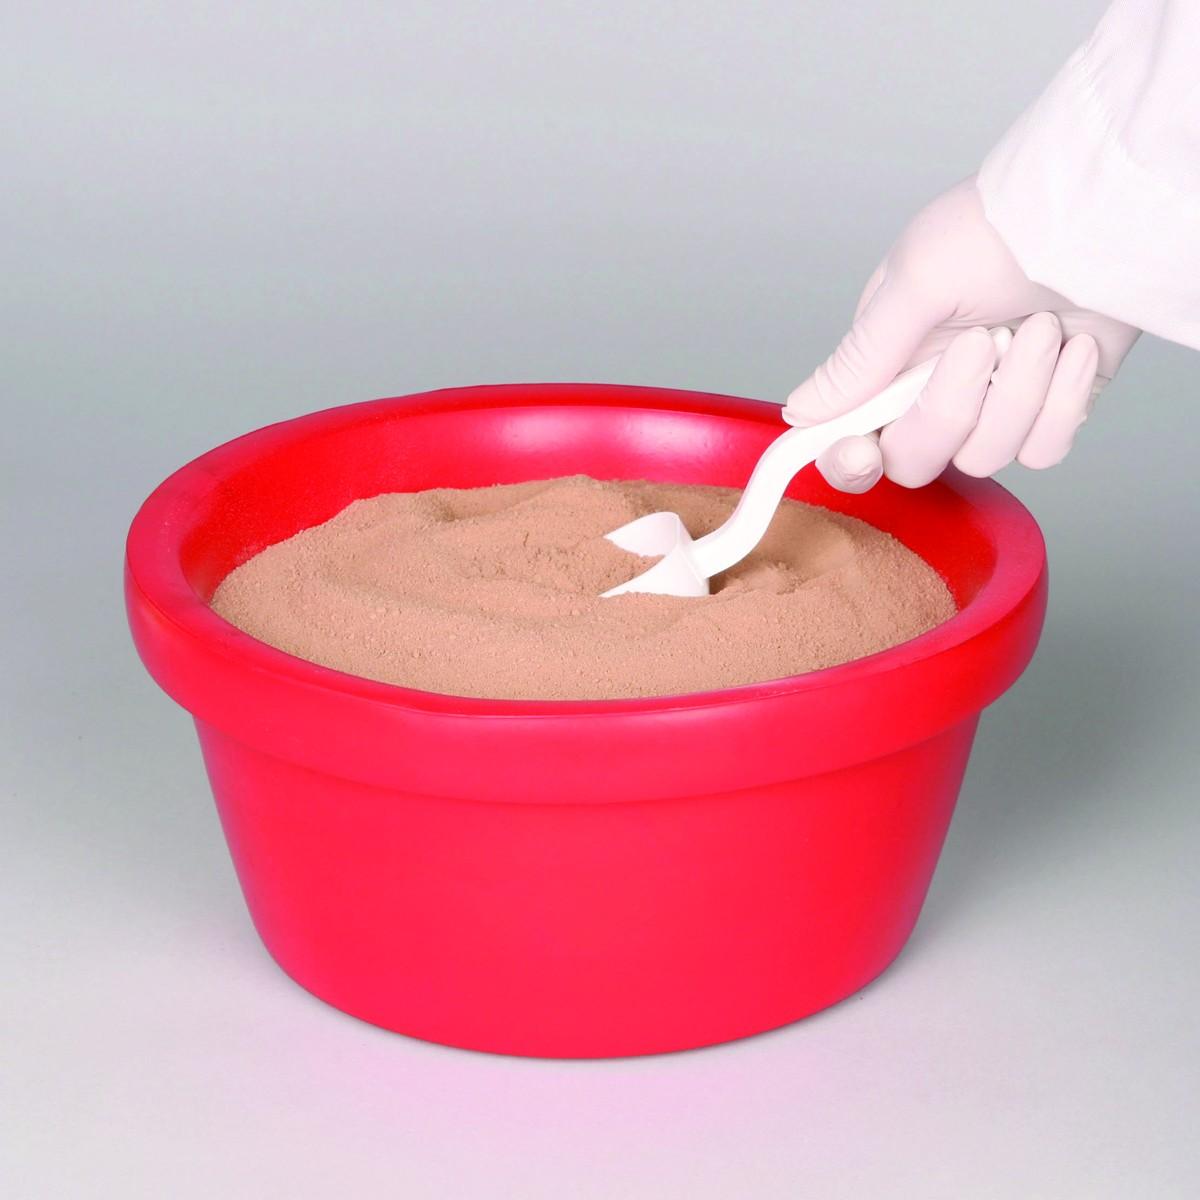 Sterileware Bent Handle Sterile Scoops